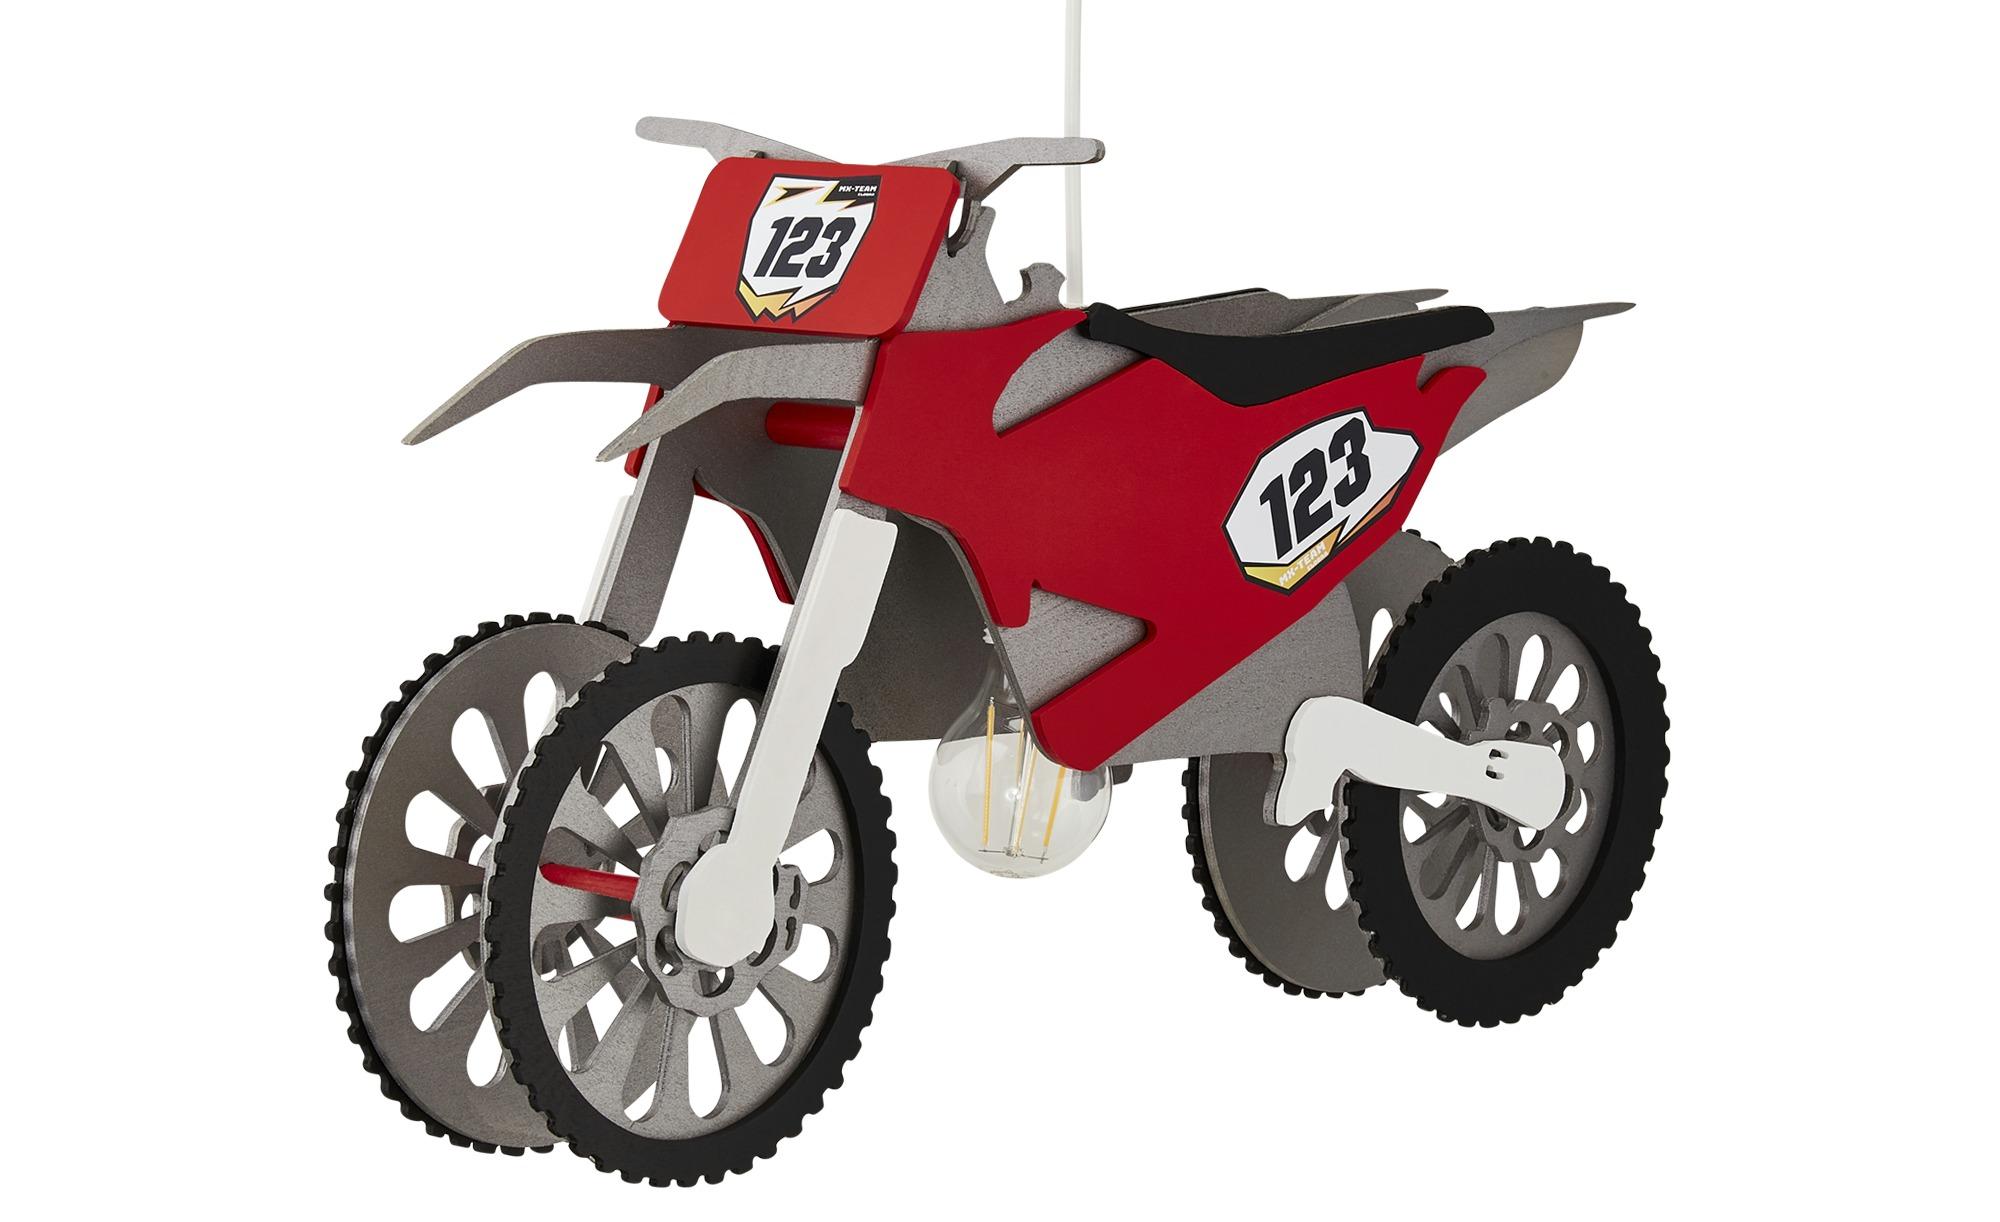 Pendelleuchte, 1-flammig, Motocrossmaschine ¦ rot ¦ Maße (cm): B: 30 T: 20 Lampen & Leuchten > Innenleuchten > Kinderlampen - Höffner